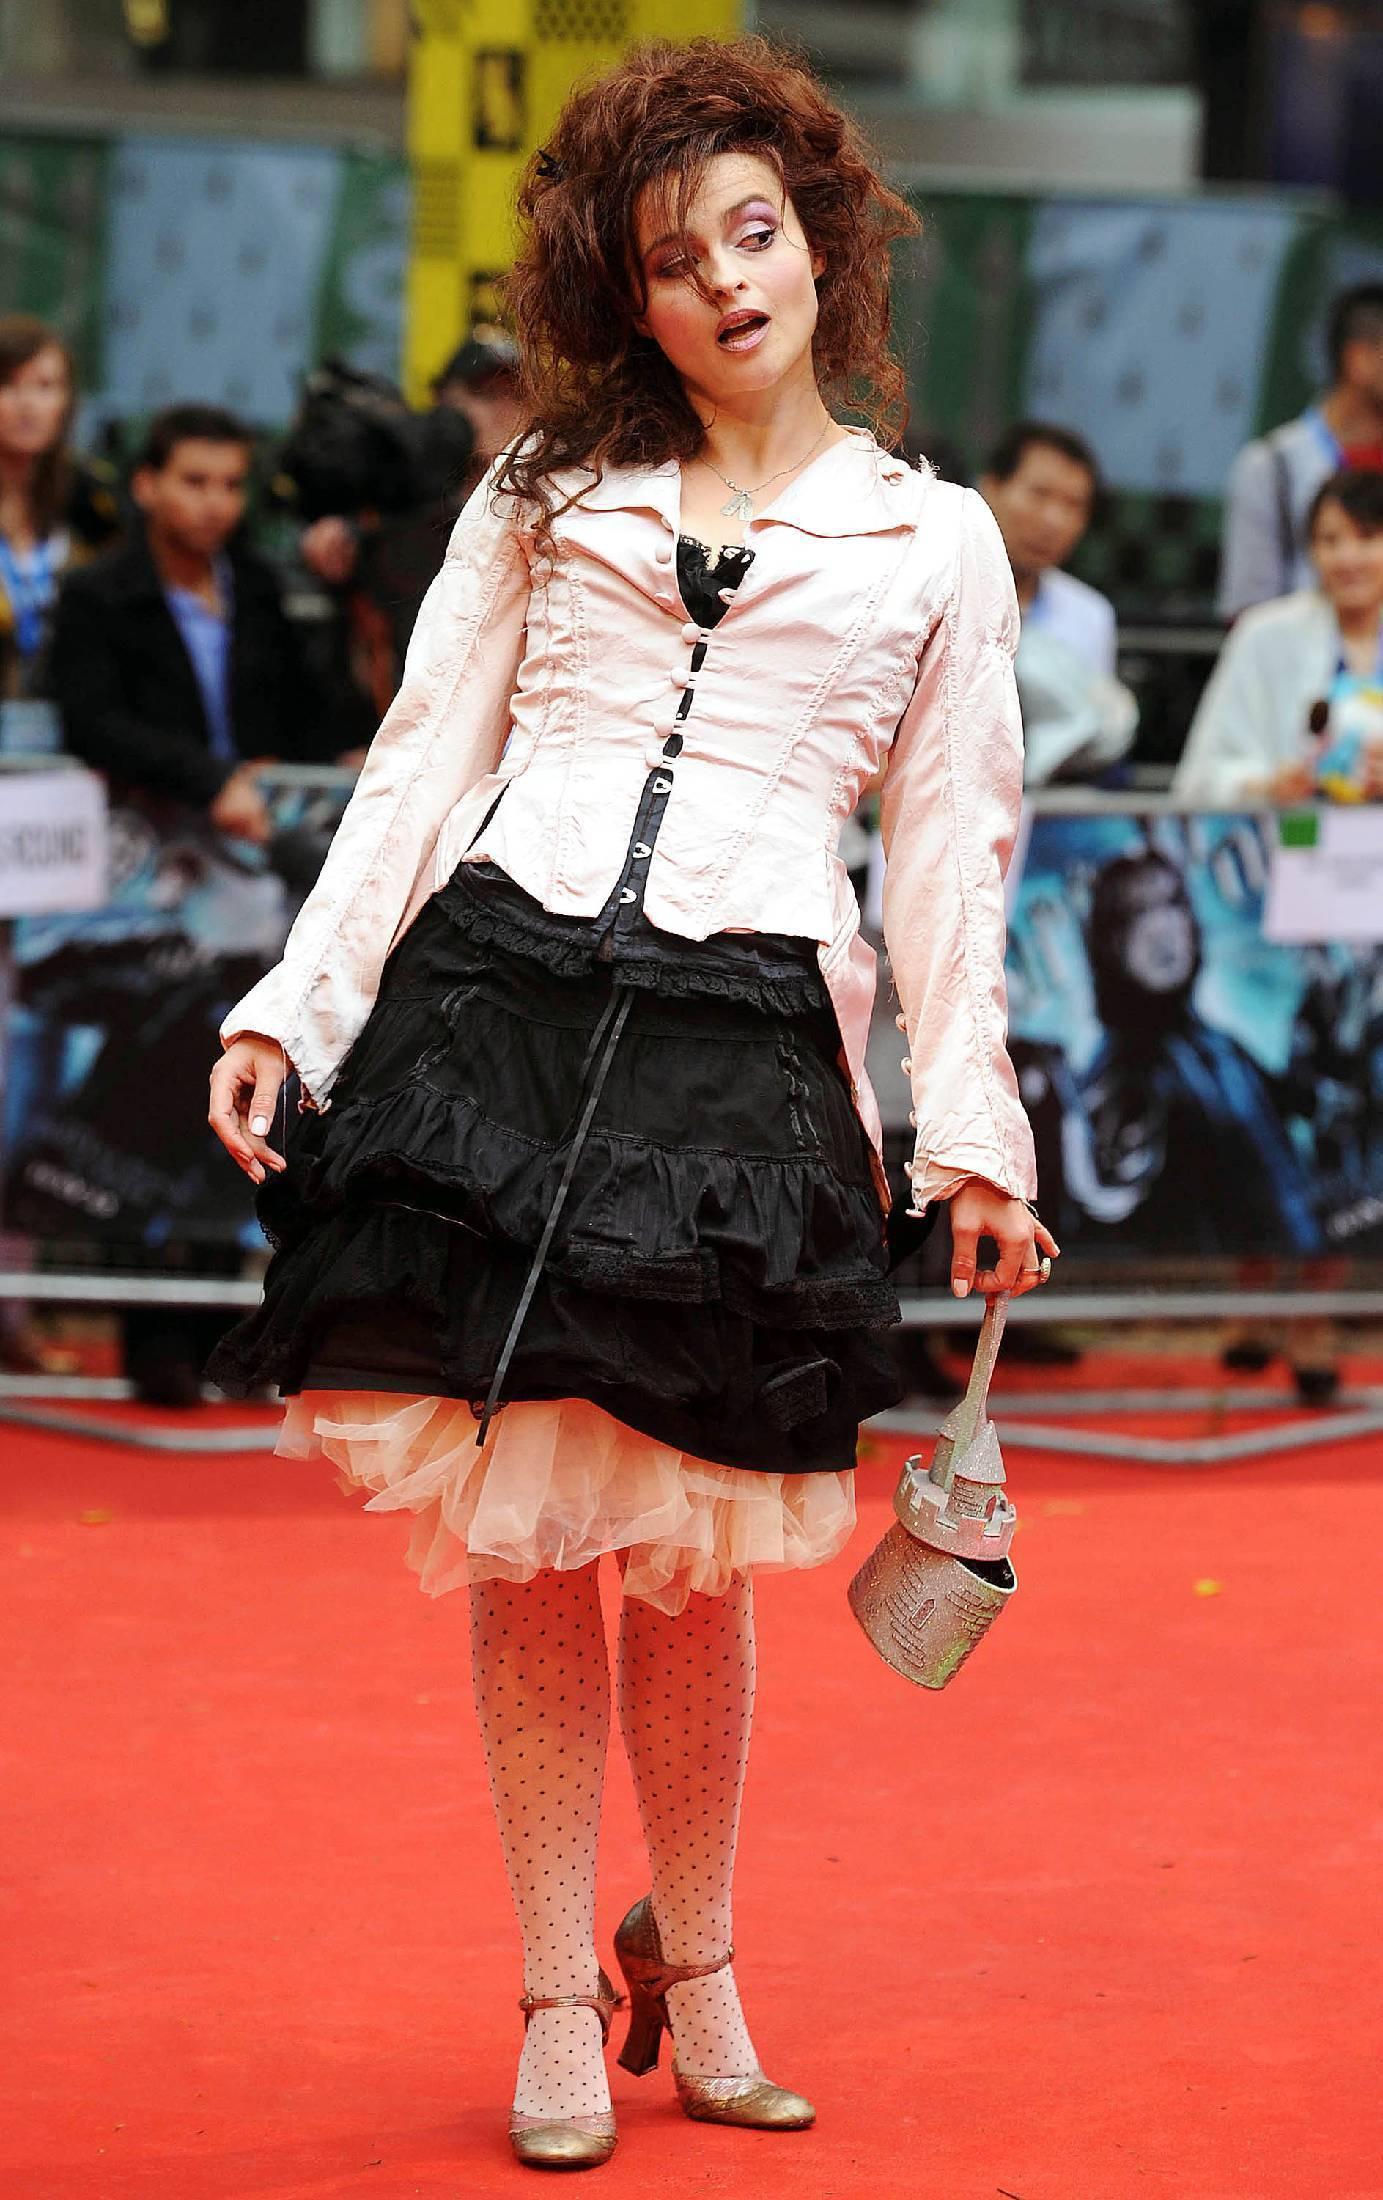 Helena Bonham Carter Cast as Fairy Godmother in Disney's Cinderella